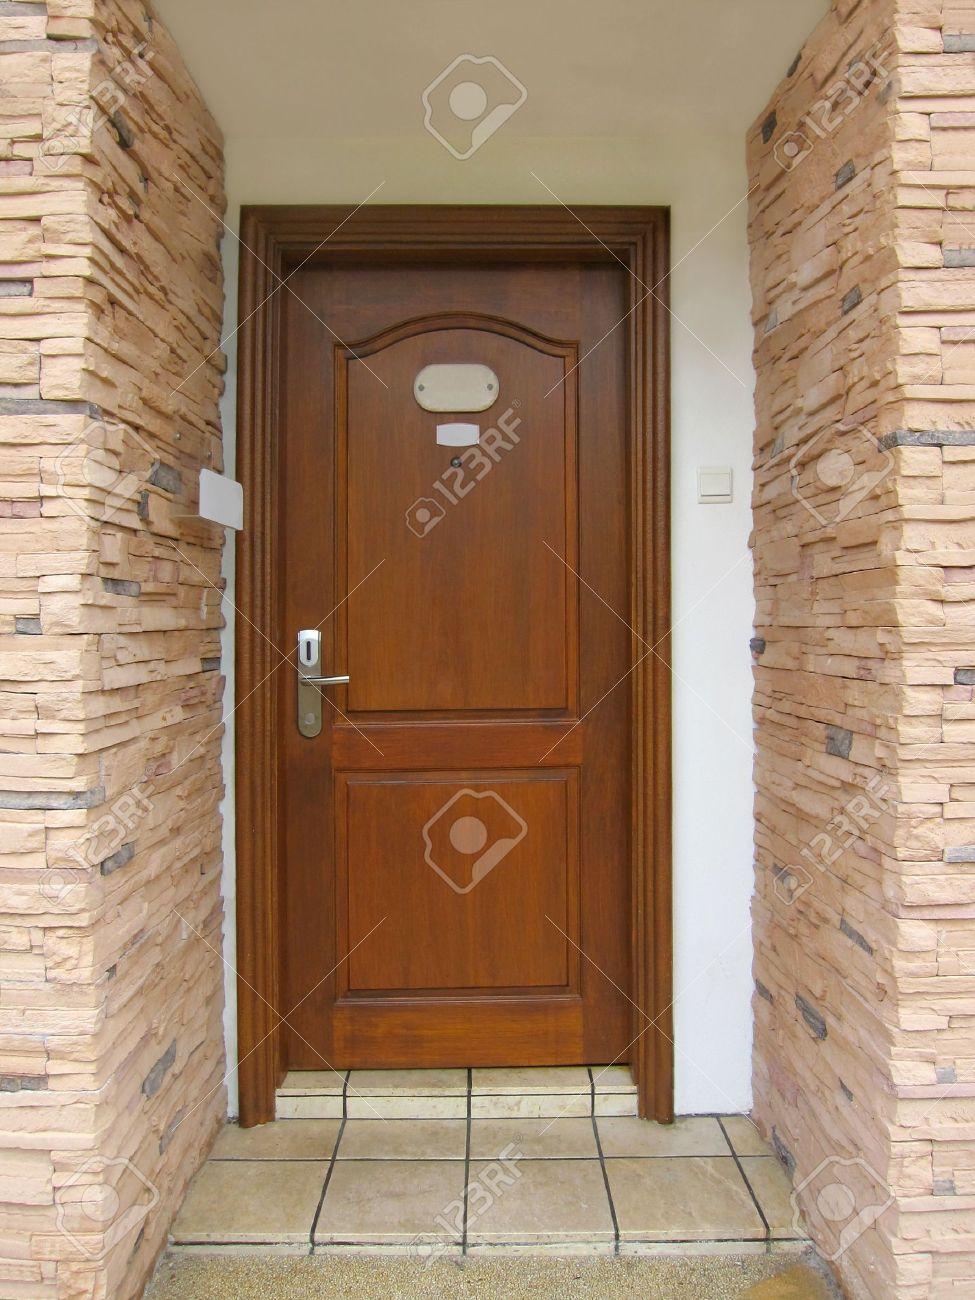 resorts puerta de madera entrada a la sala foto de archivo